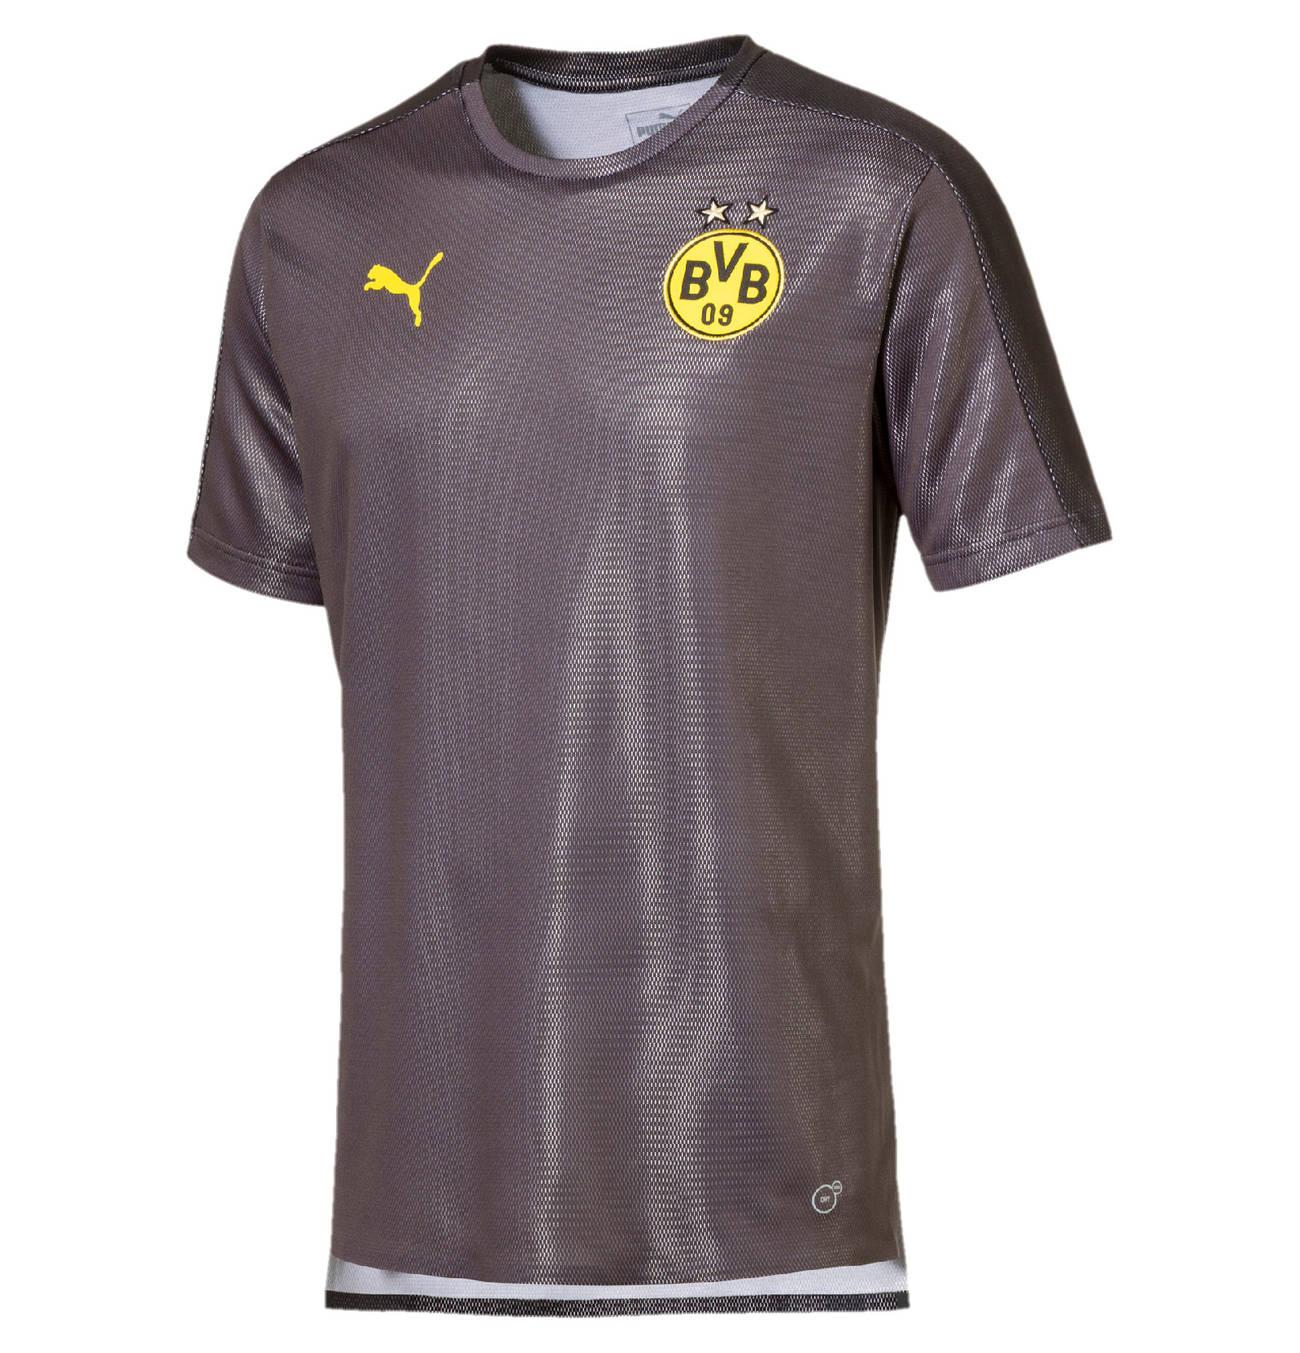 Bvb Trikot Stadium 2018 19 Fur Herren Sponsor Logo Herren T Shirt Und Trikot